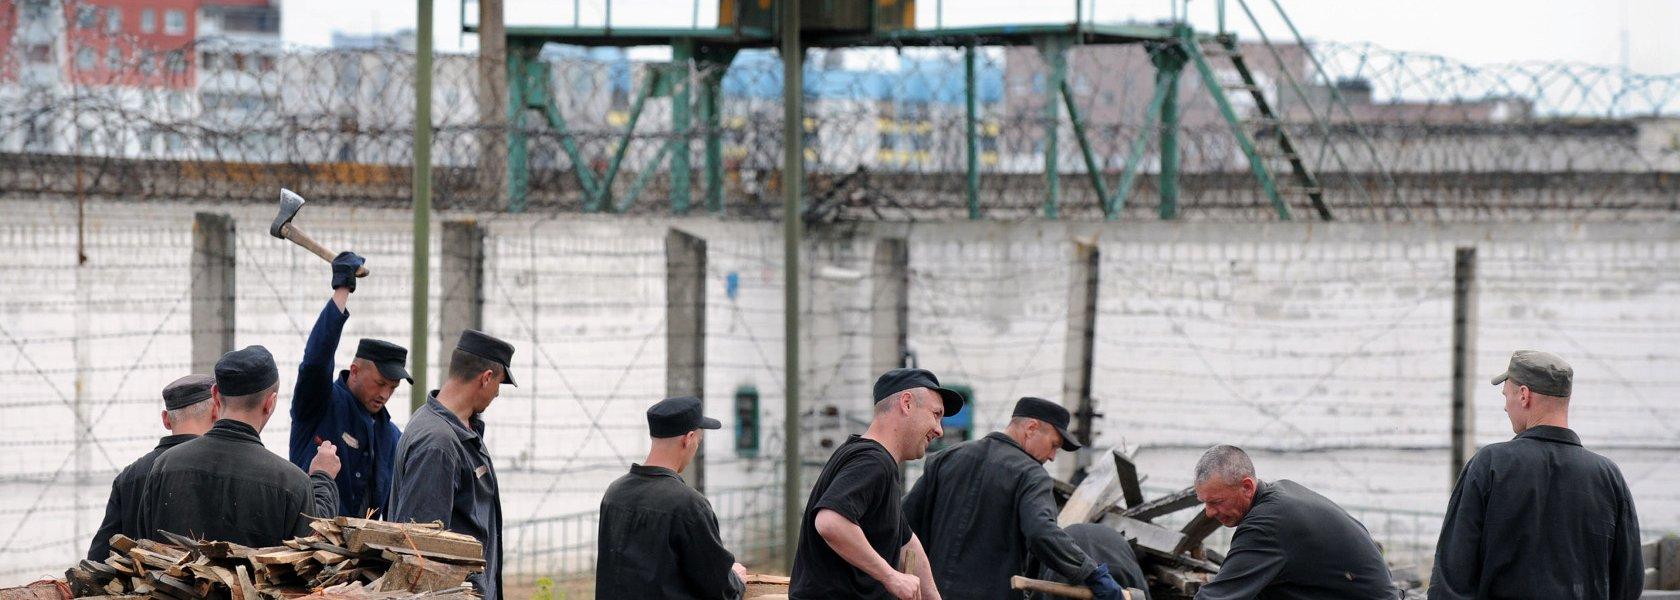 majikan kejam eksplotasi tindas pekerja belarus